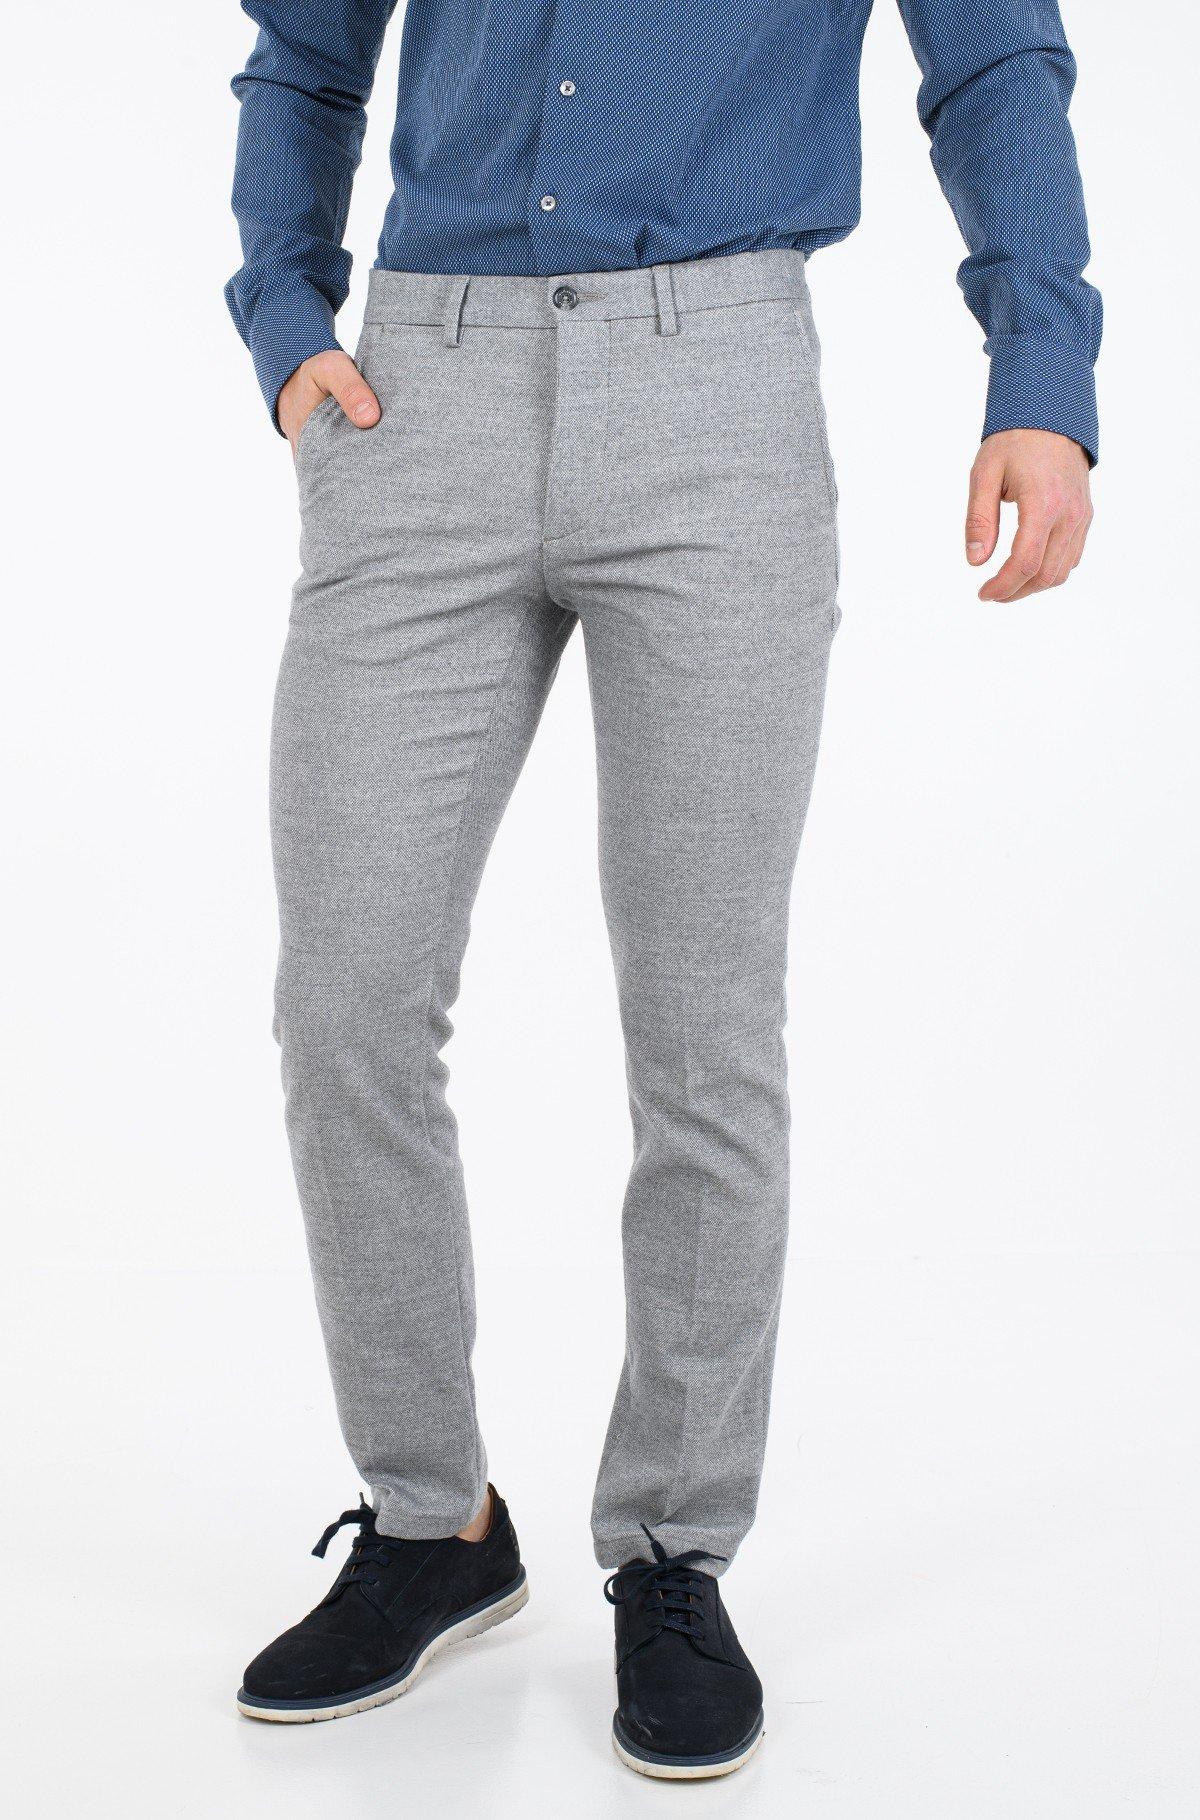 Kelnės su kantu DENTON CHINO WOOL LOOK FLEX-full-1